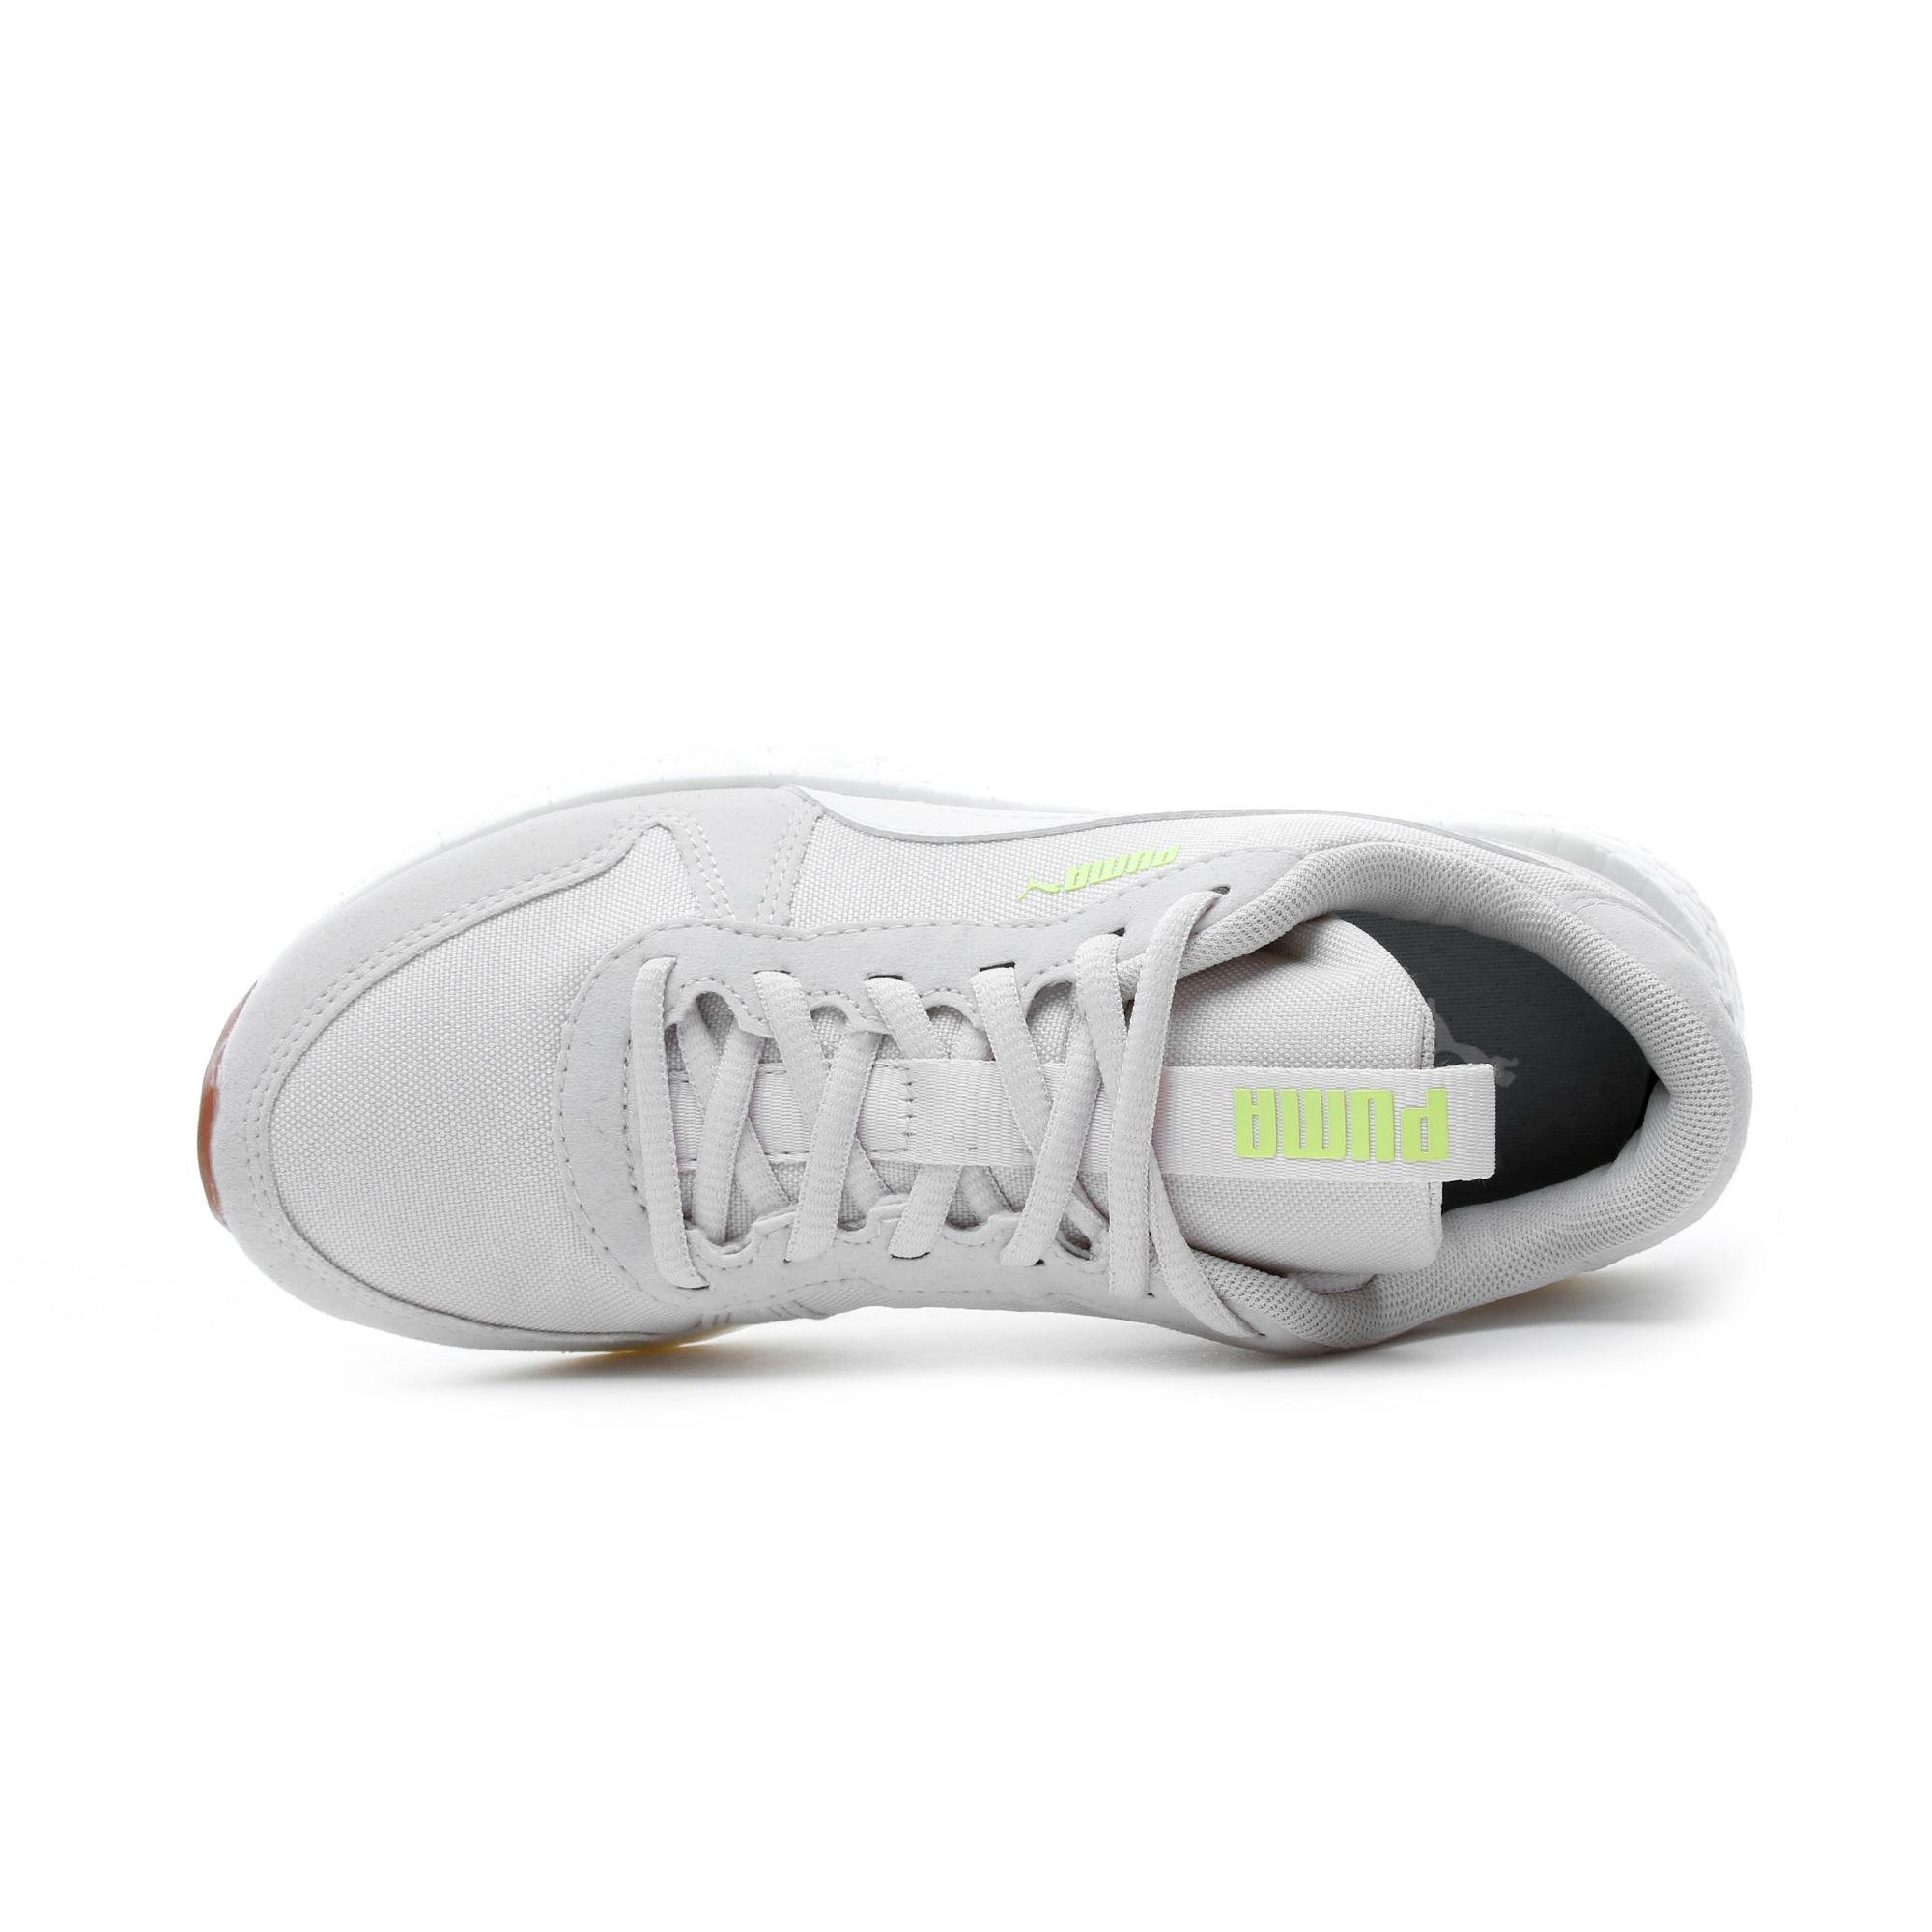 Puma Nrgy Neko Retro Kadın Gri Spor Ayakkabı